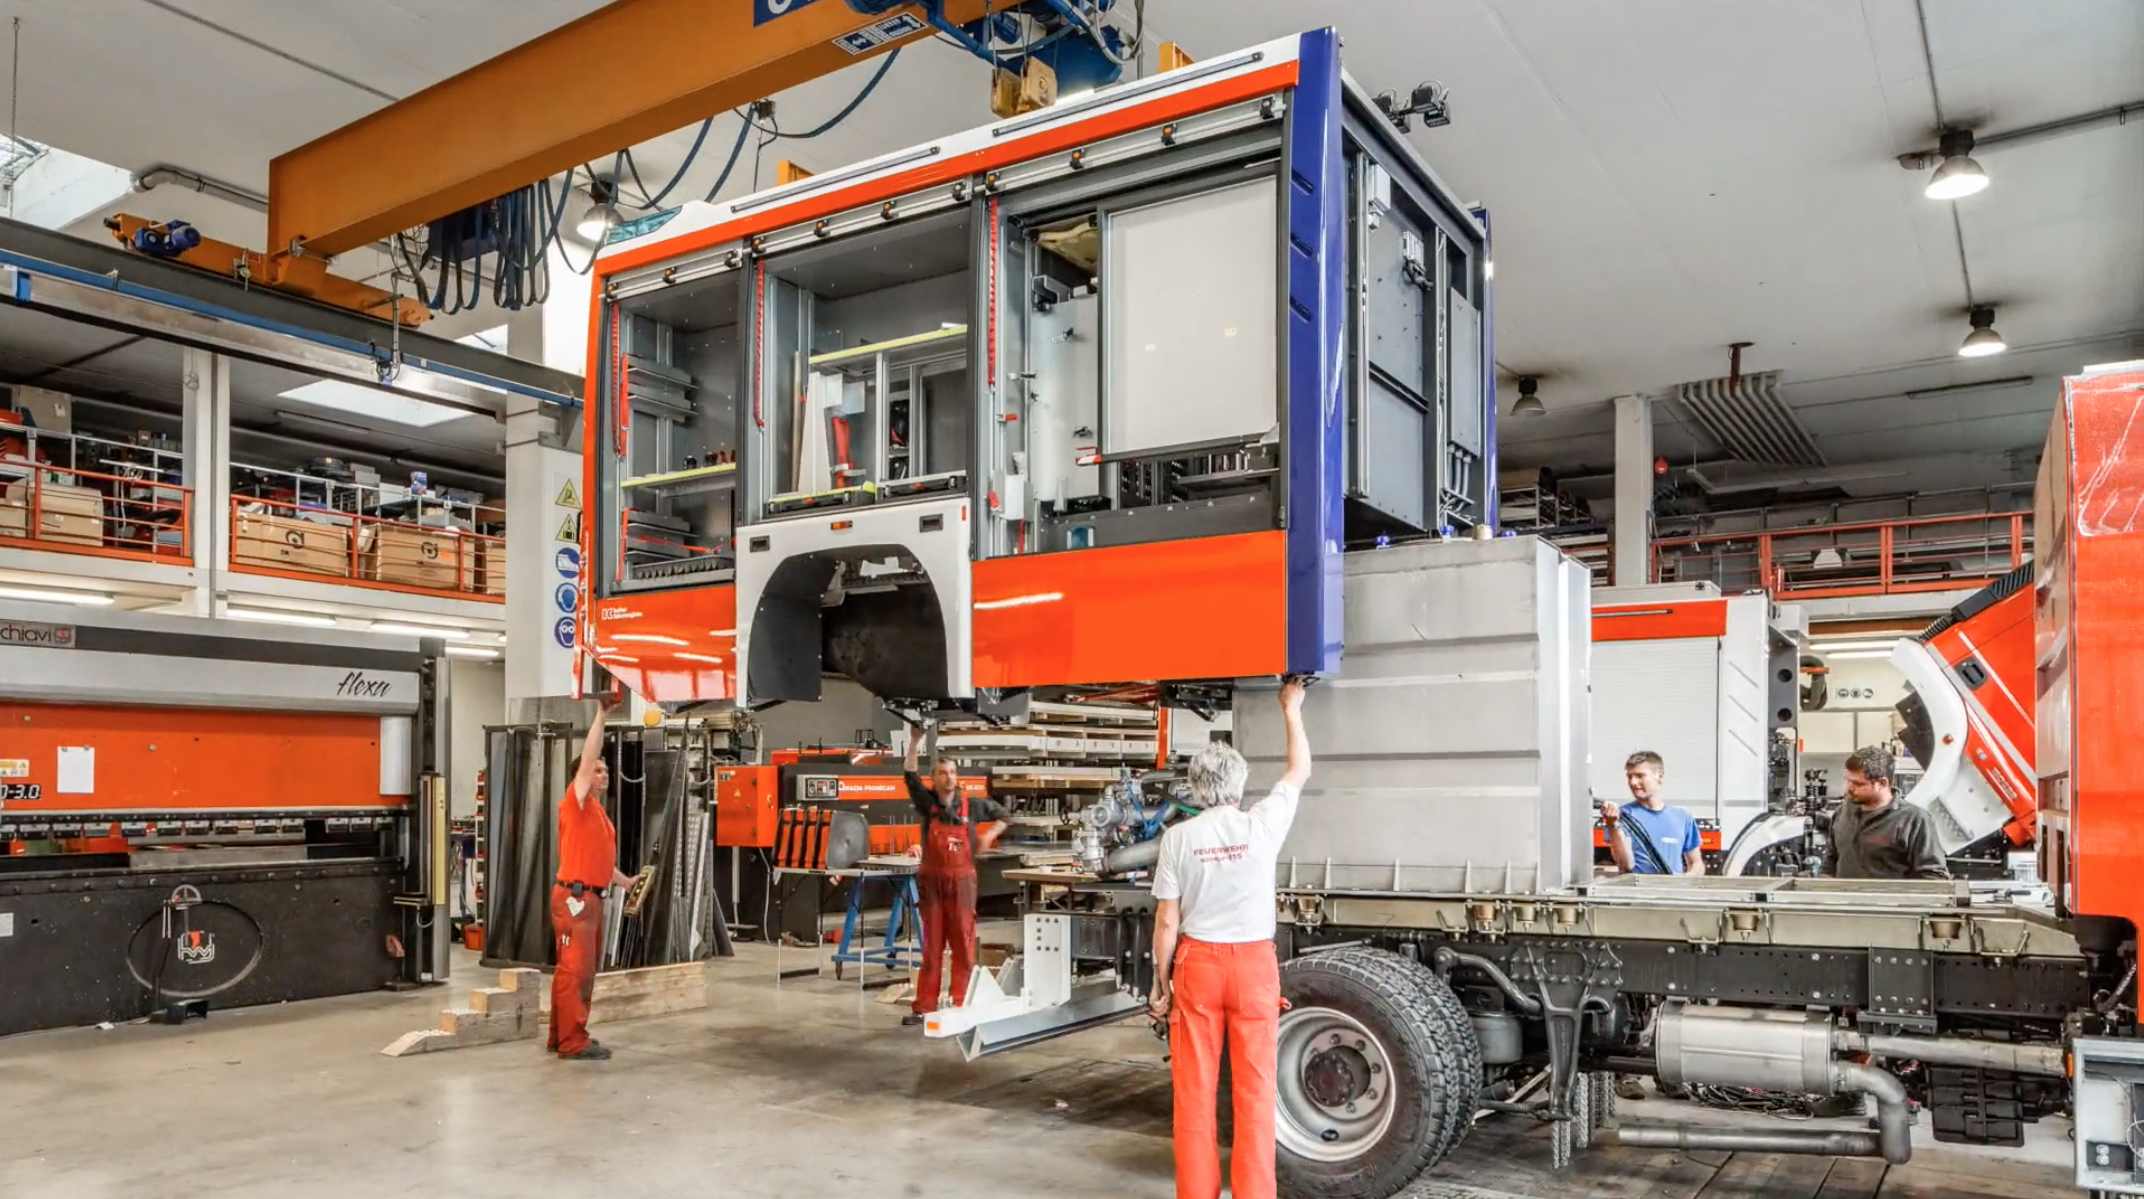 Making-of-FF-Wertingen-Kofler-Fahrzeugbau